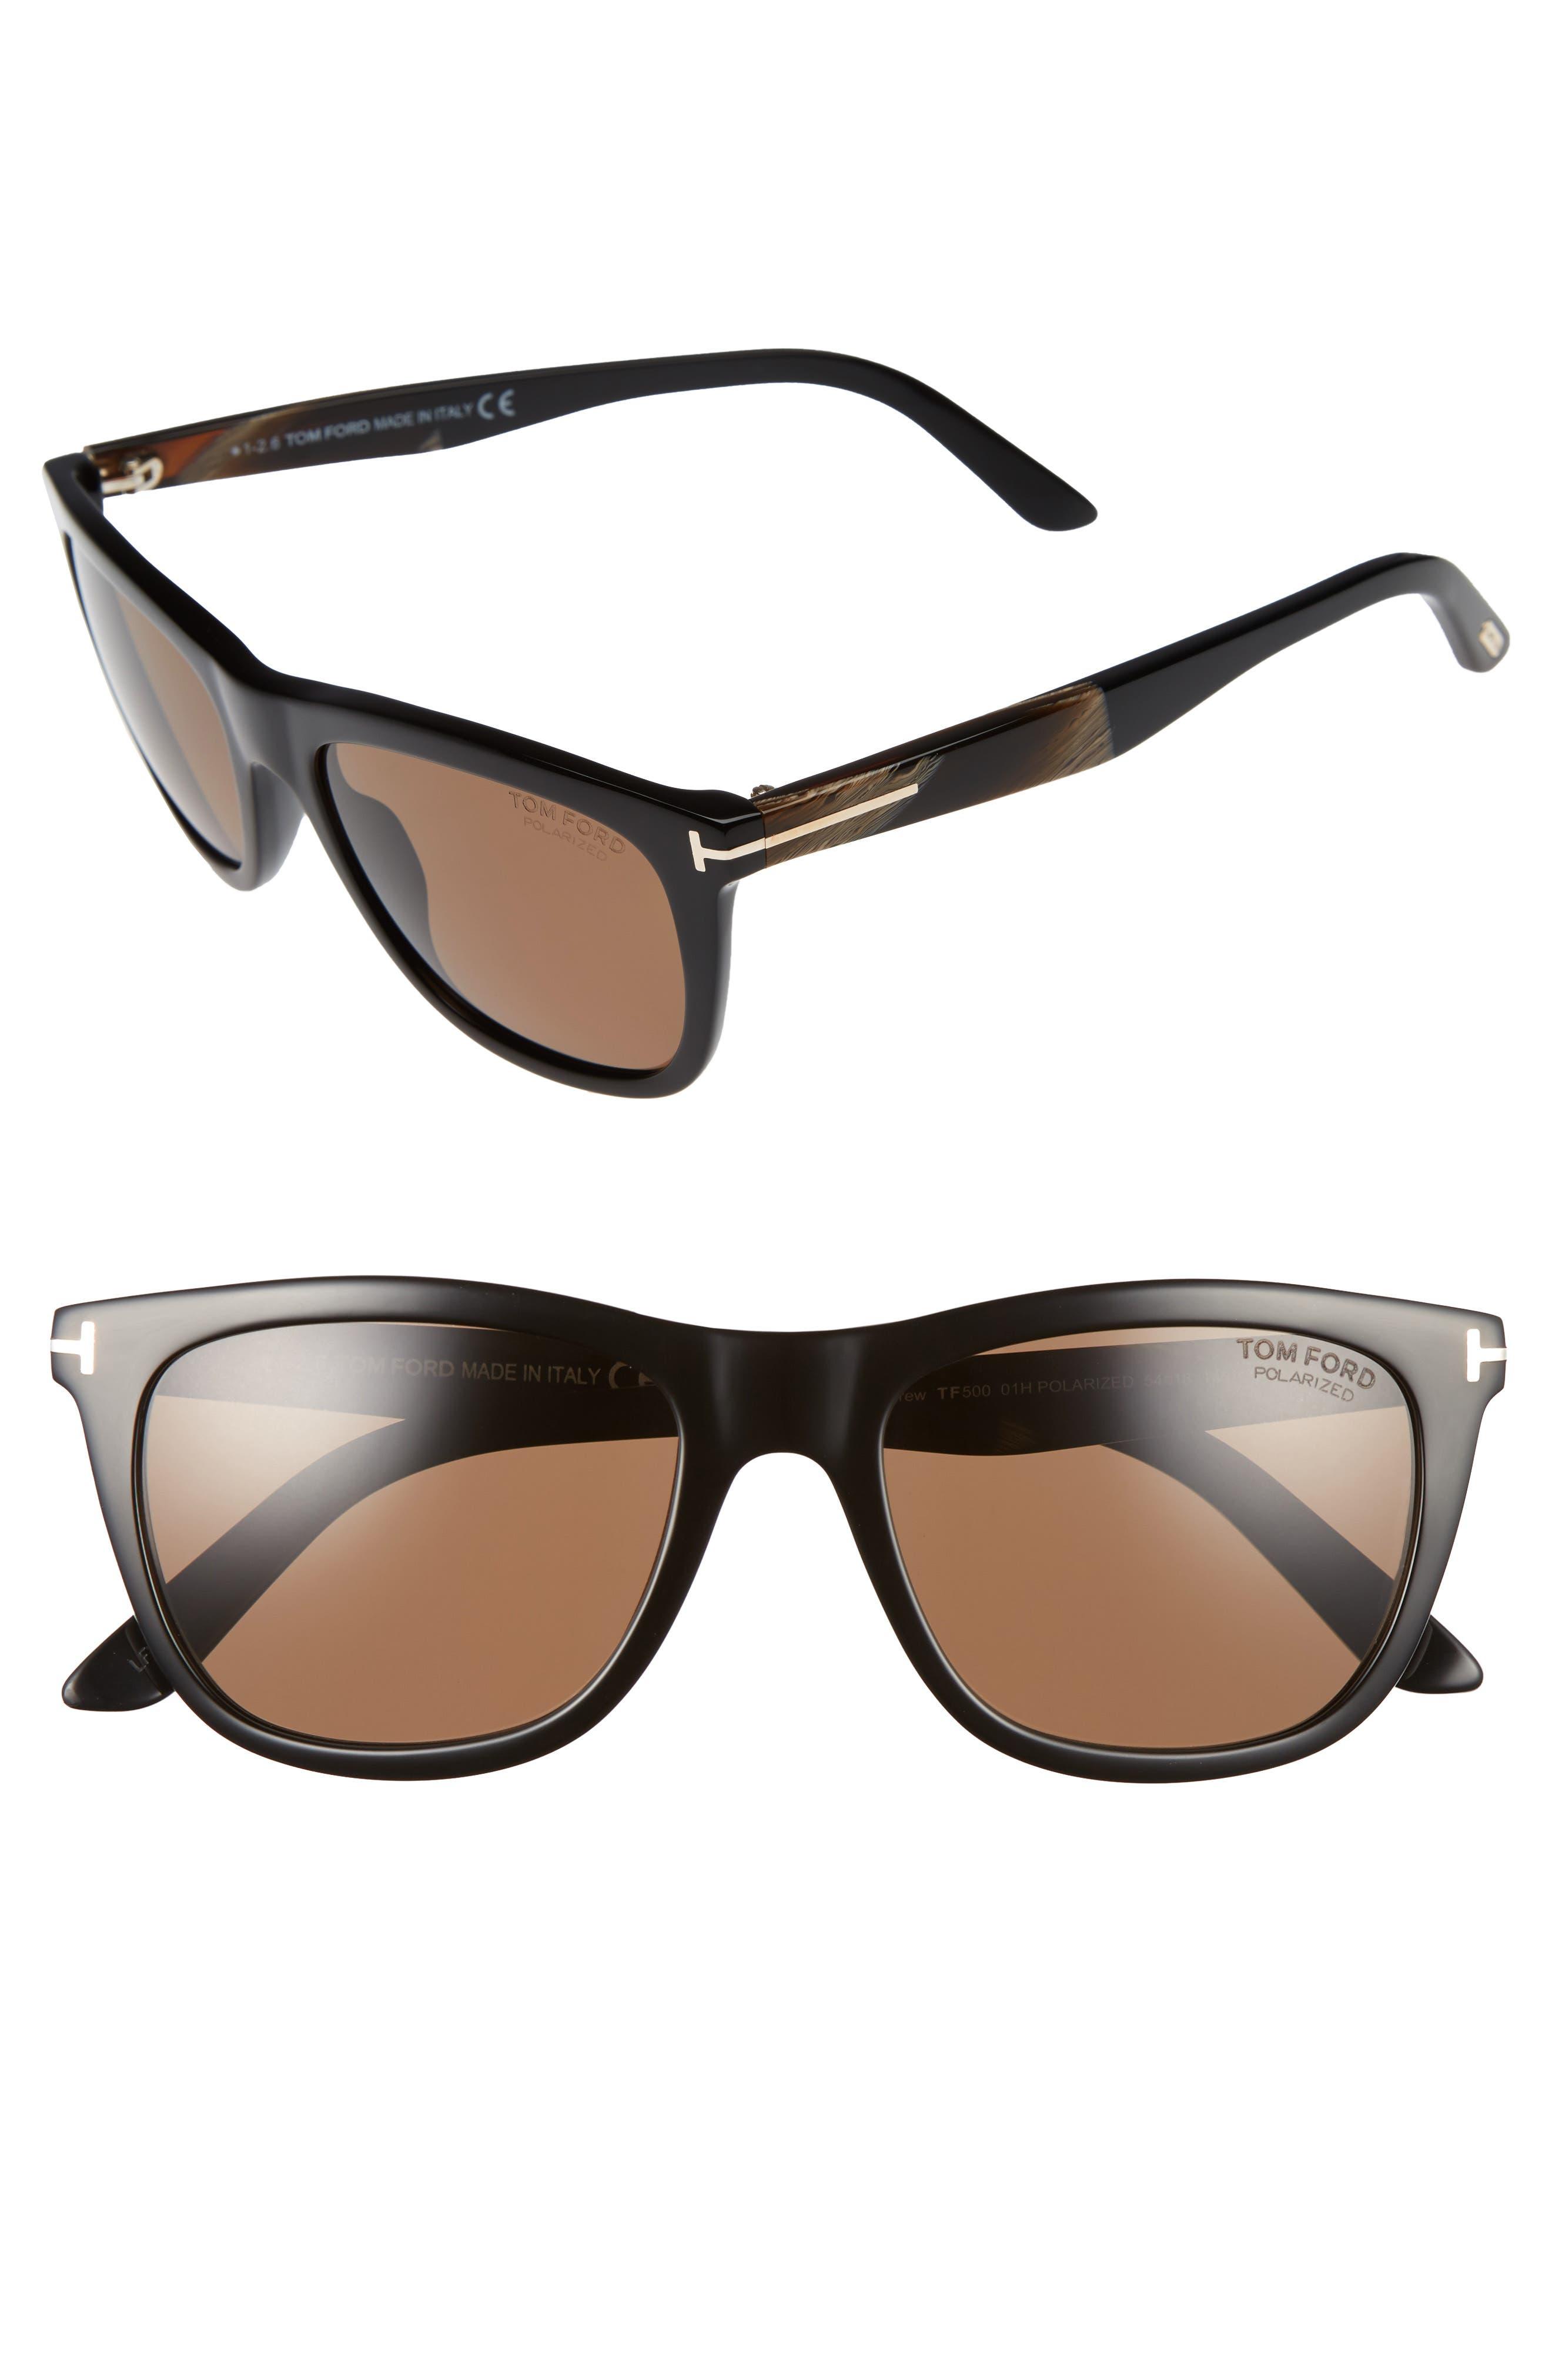 Andrew 54mm Sunglasses,                             Alternate thumbnail 3, color,                             001